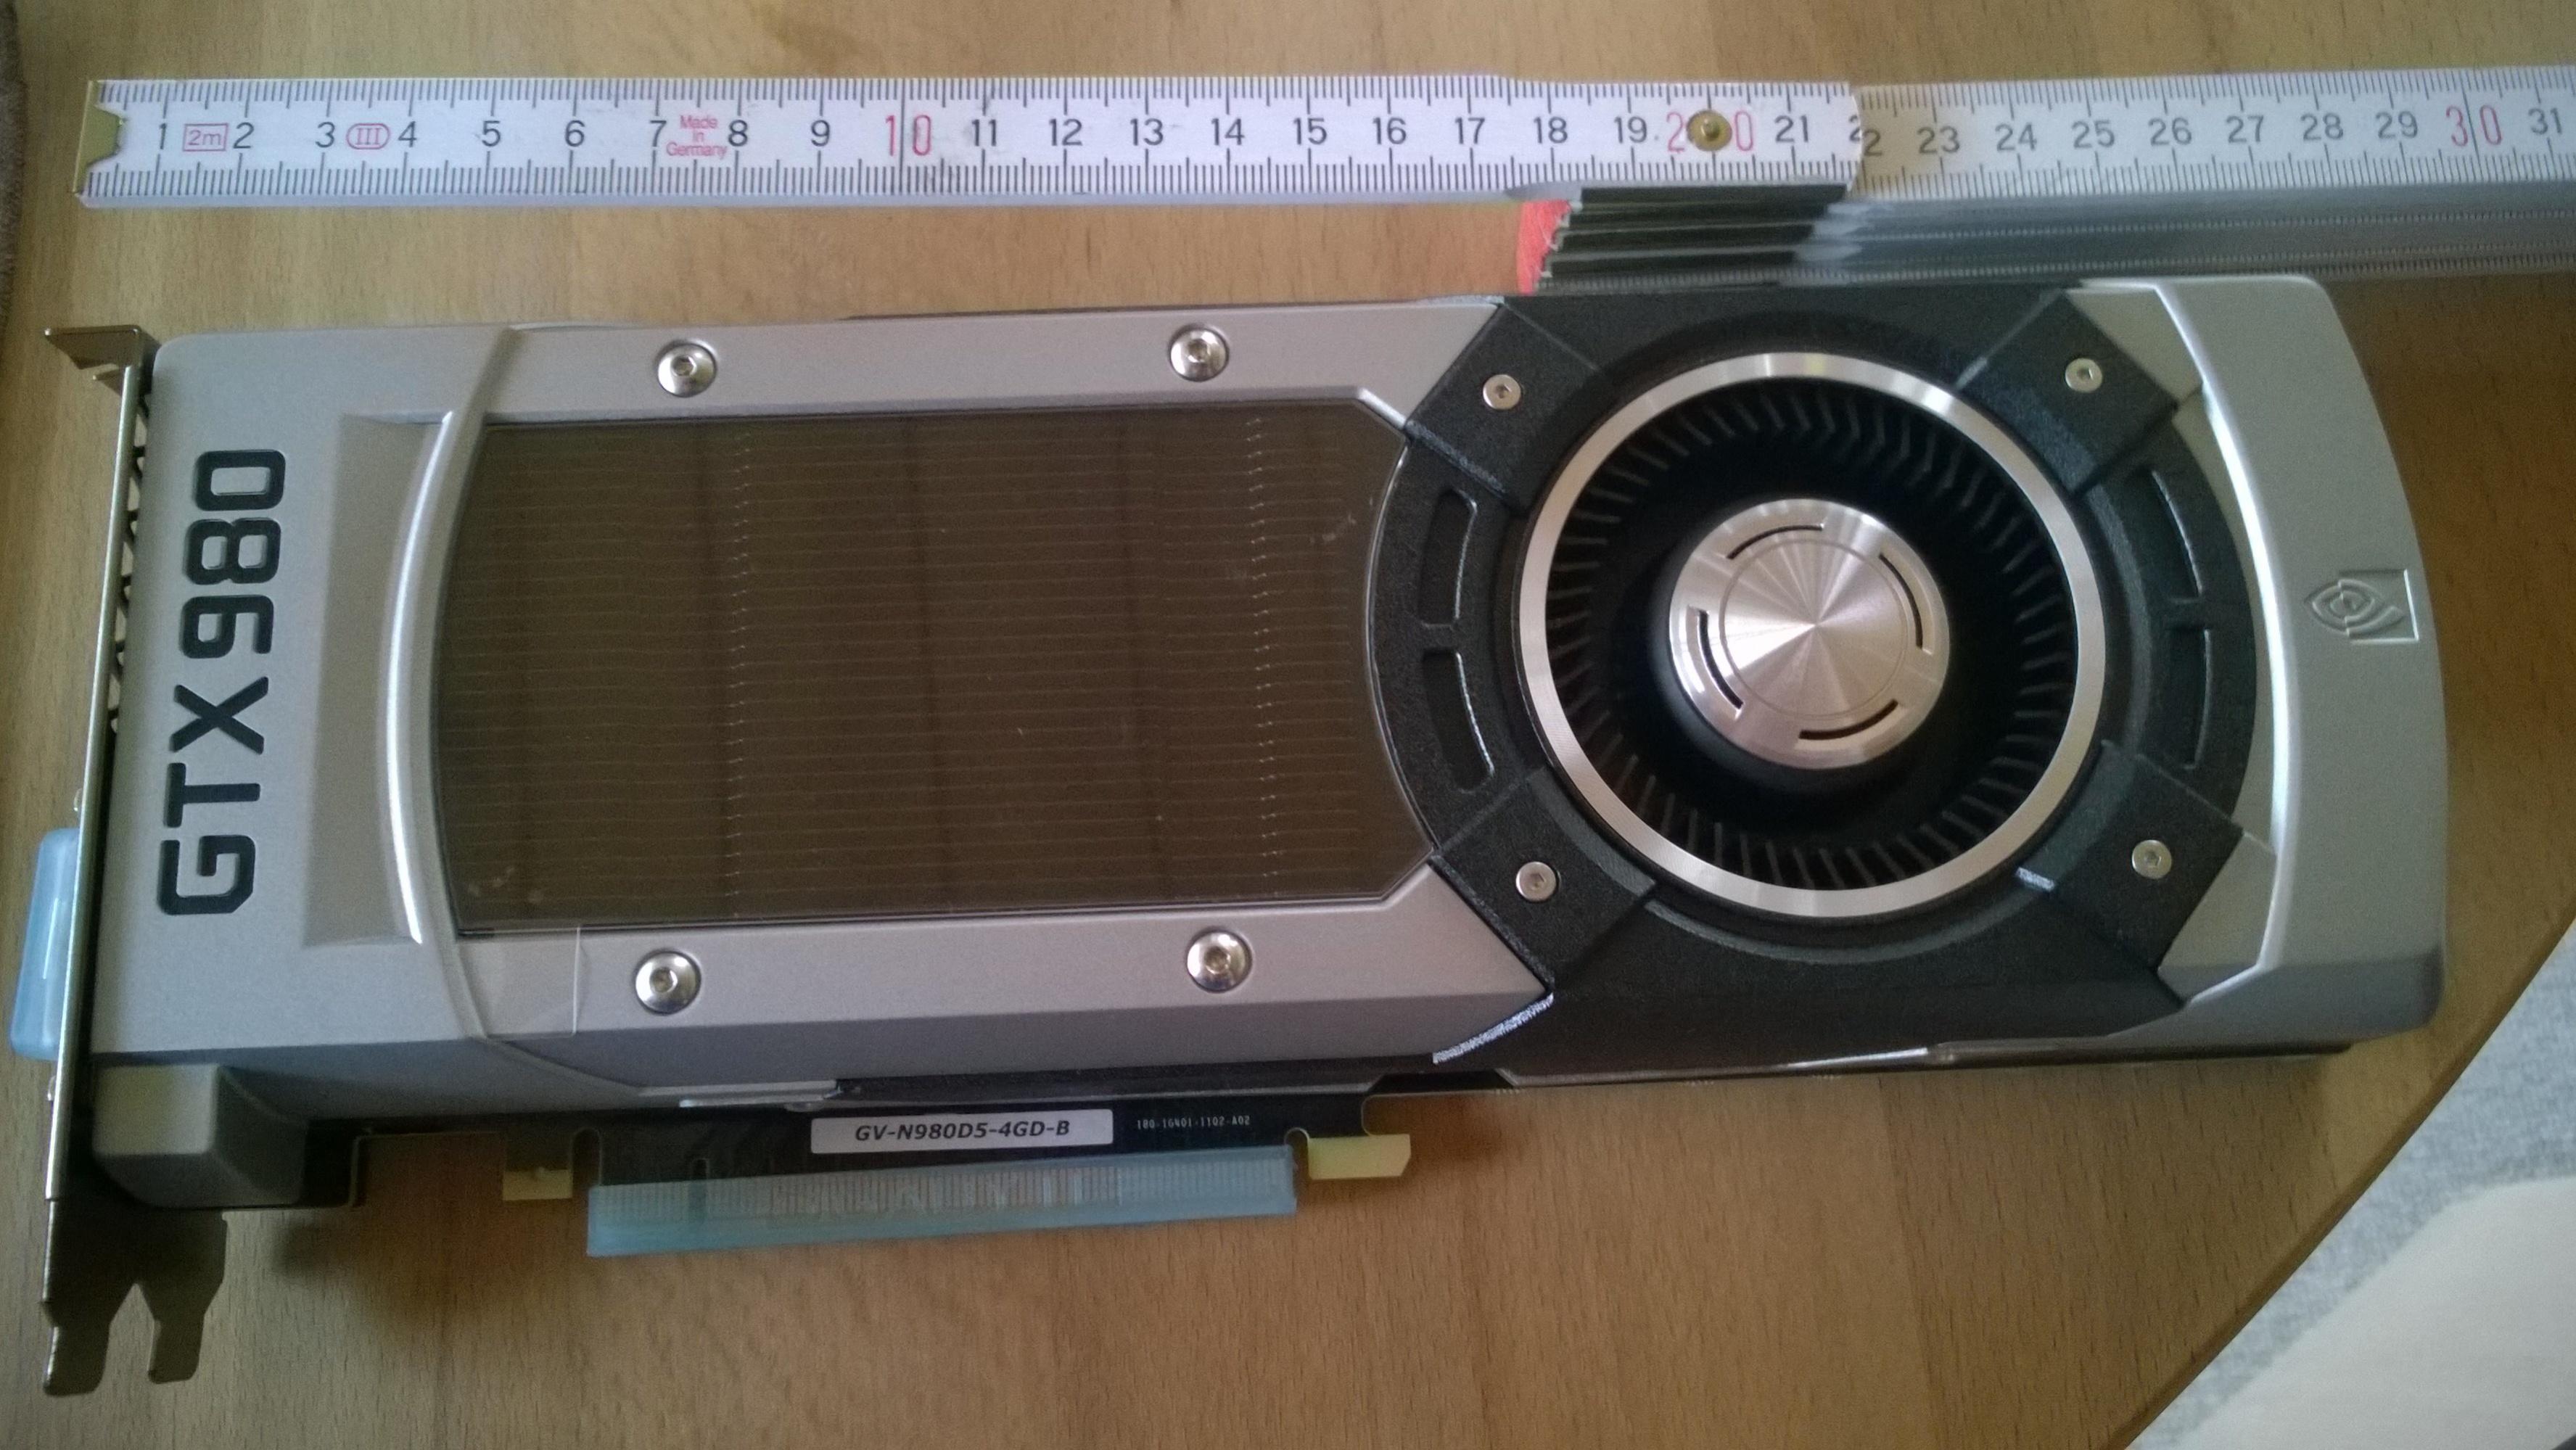 http://extreme.pcgameshardware.de/attachments/778020d1413306536-gtx-980-umbau-mit-accelero-twin-turbo-3-a-wp_20141006_002.jpg